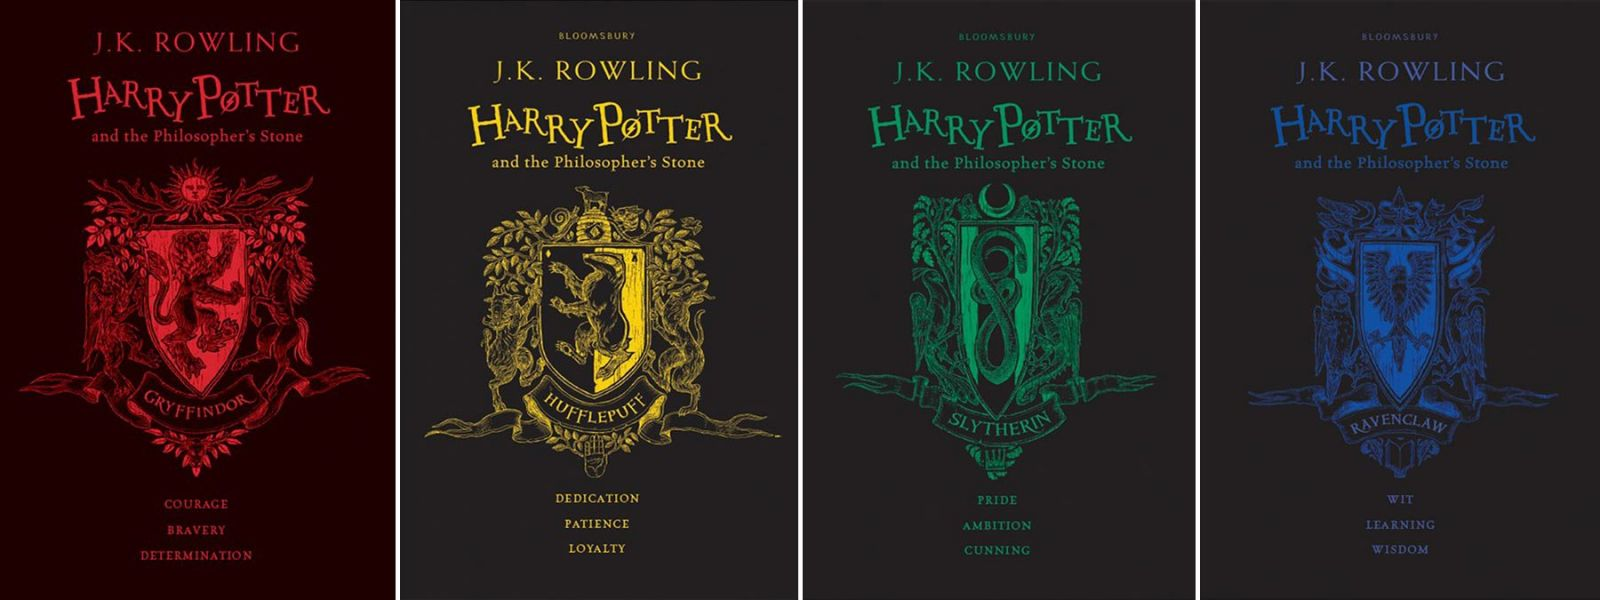 Beroemd Harry Potter Achtergrond - ARCHIDEV @FE63